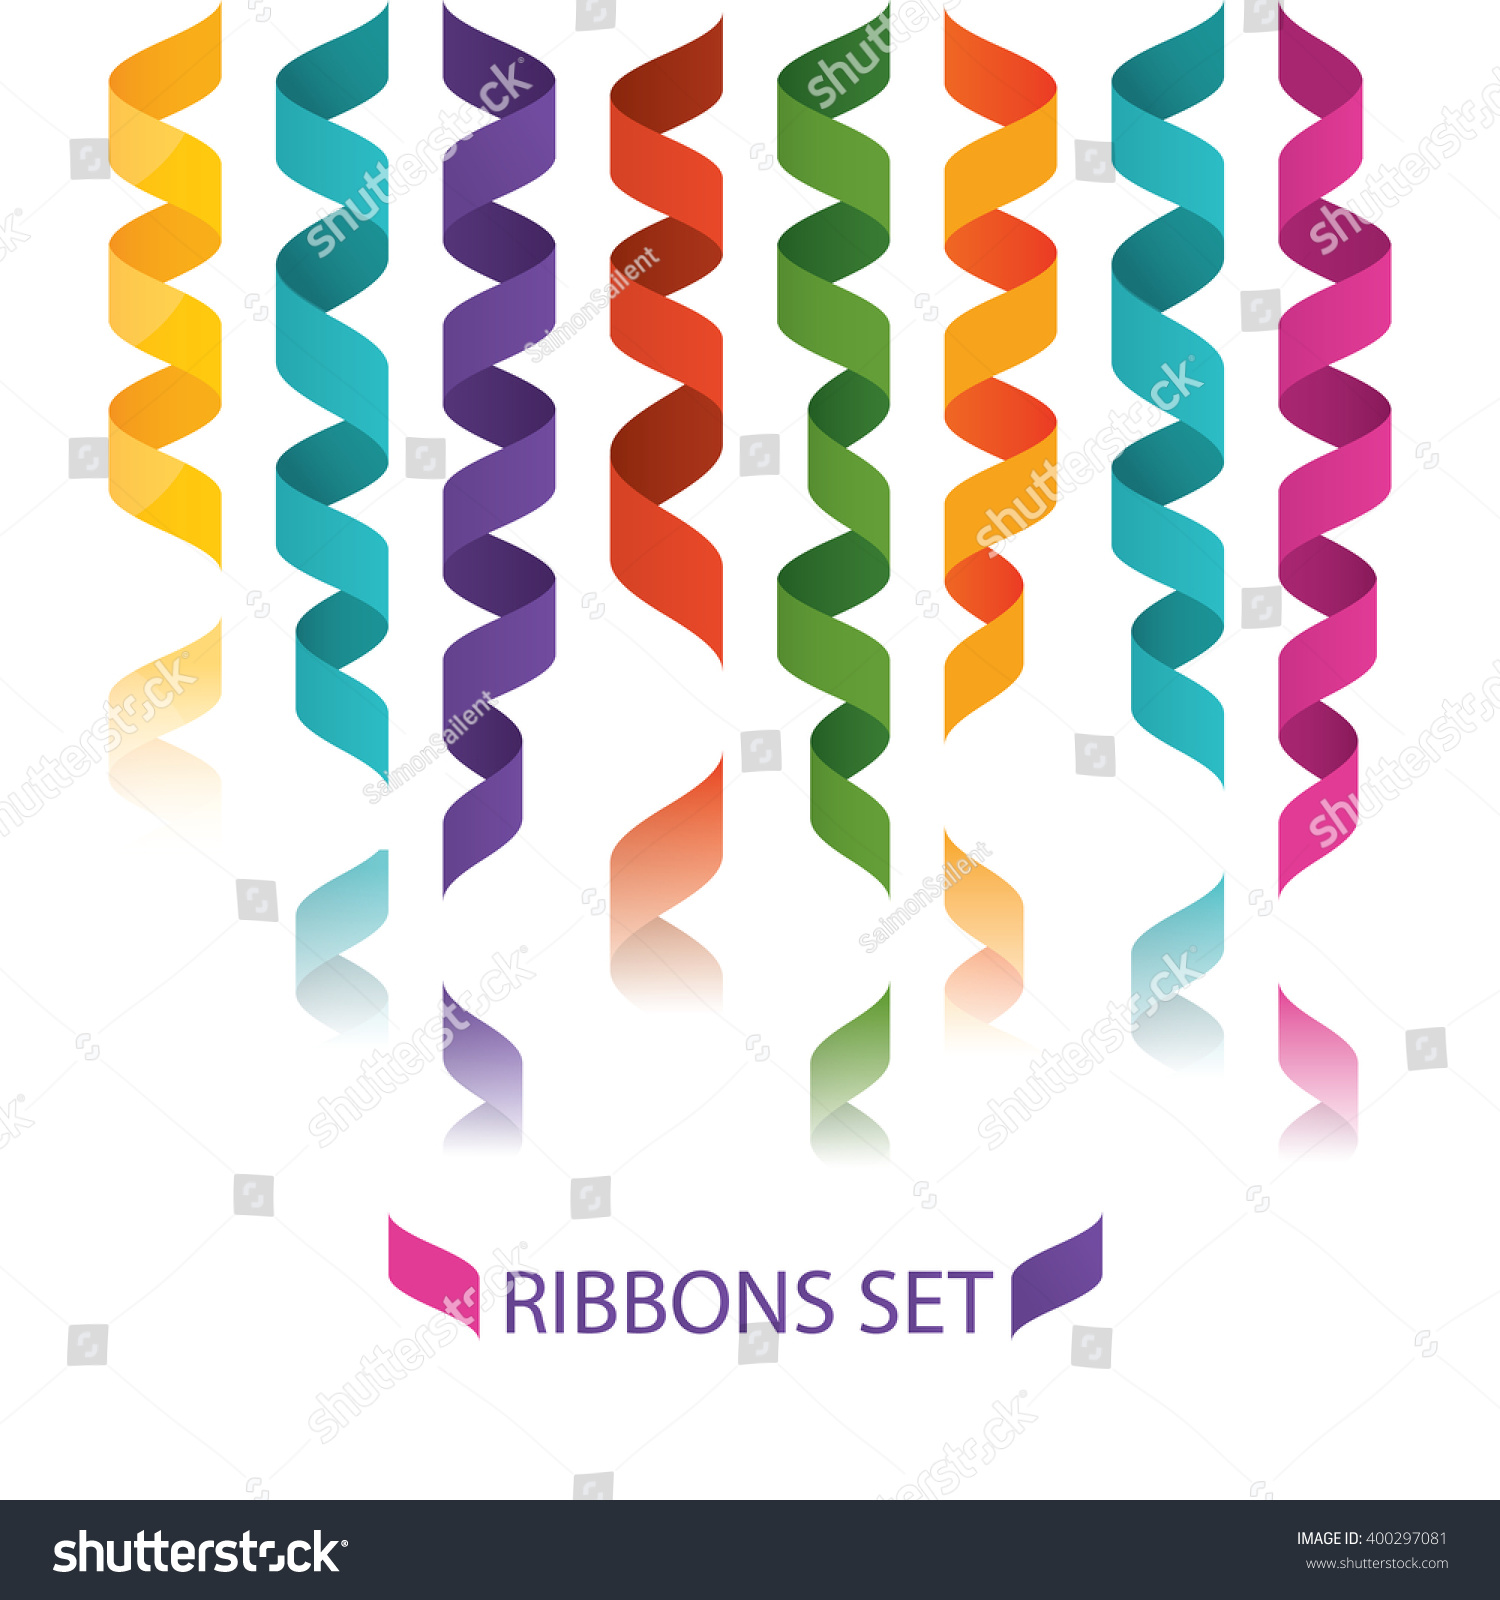 Modern Vector Illustration Colorful Flat Ribbons Stock Vector